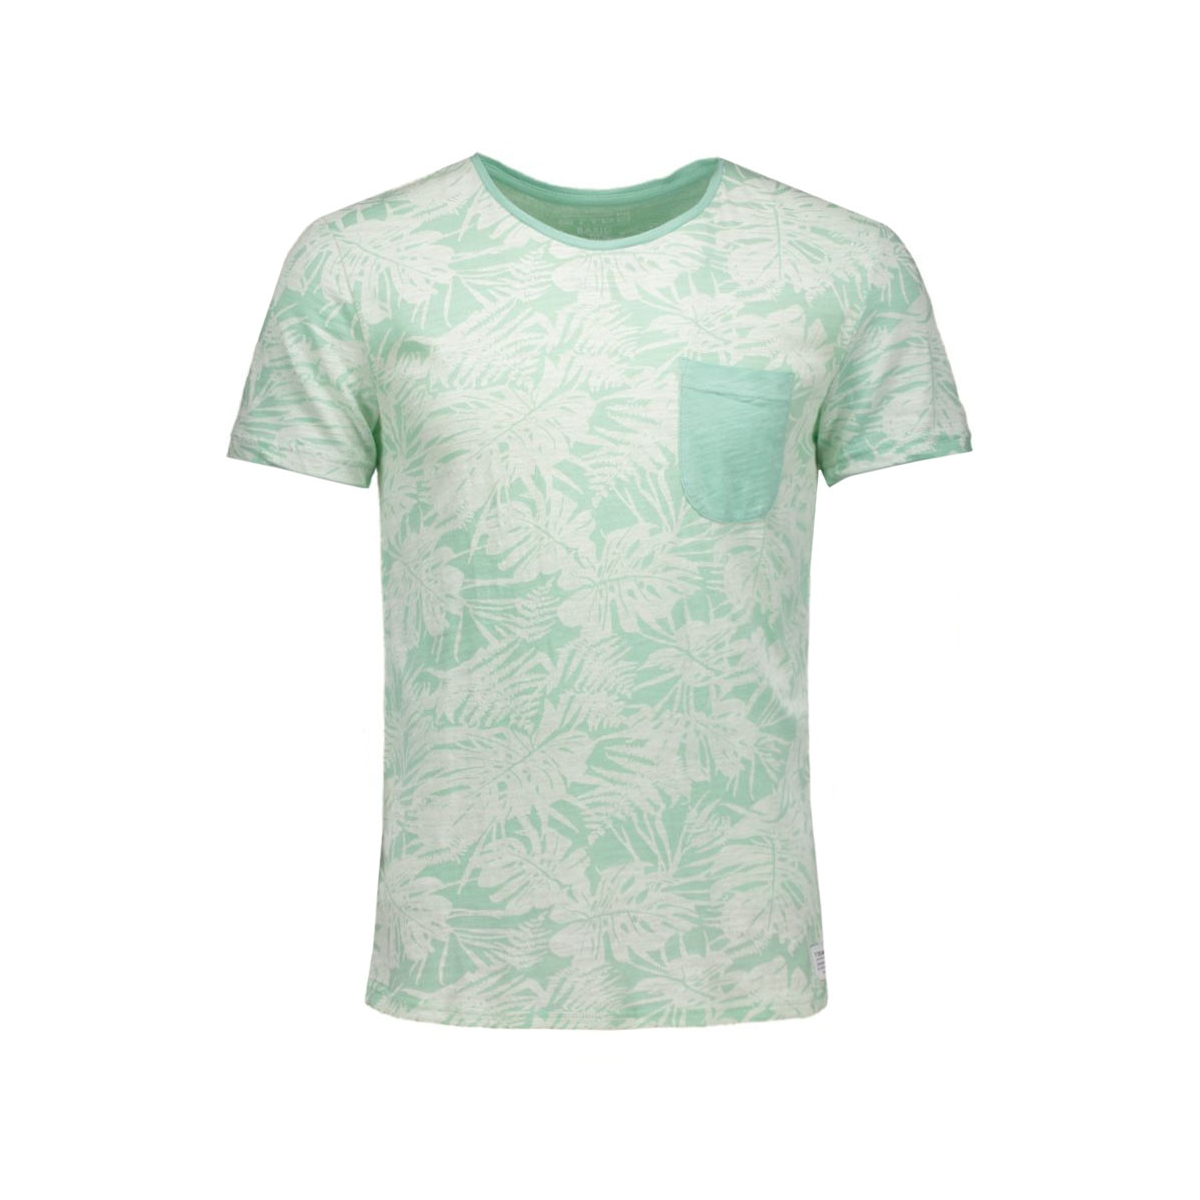 1035018.62.12 tom tailor t-shirt 7706